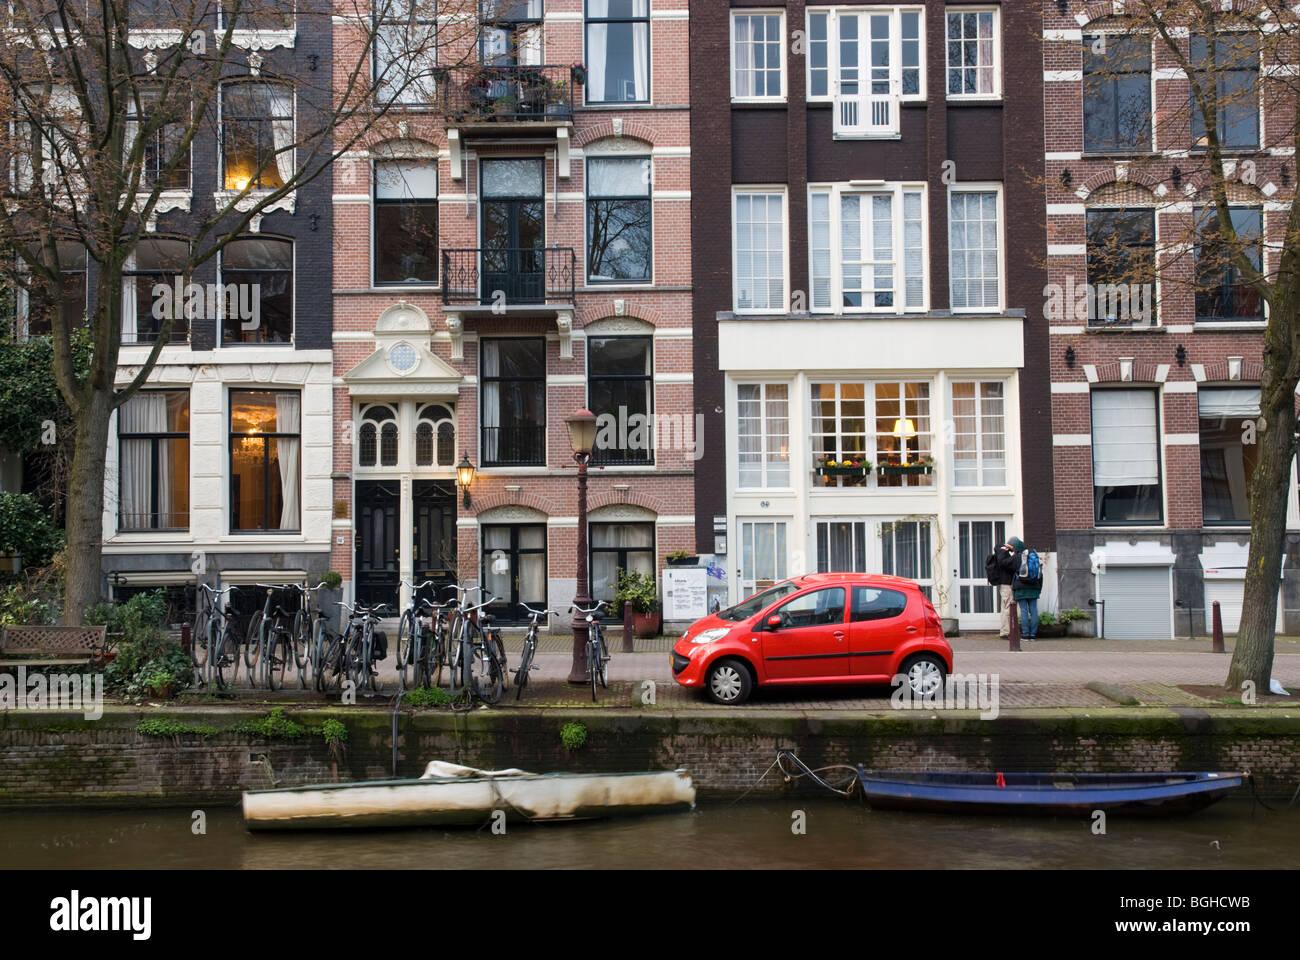 Leidsegracht, Amsterdam, Noord-Holland, Netherlands - Stock Image